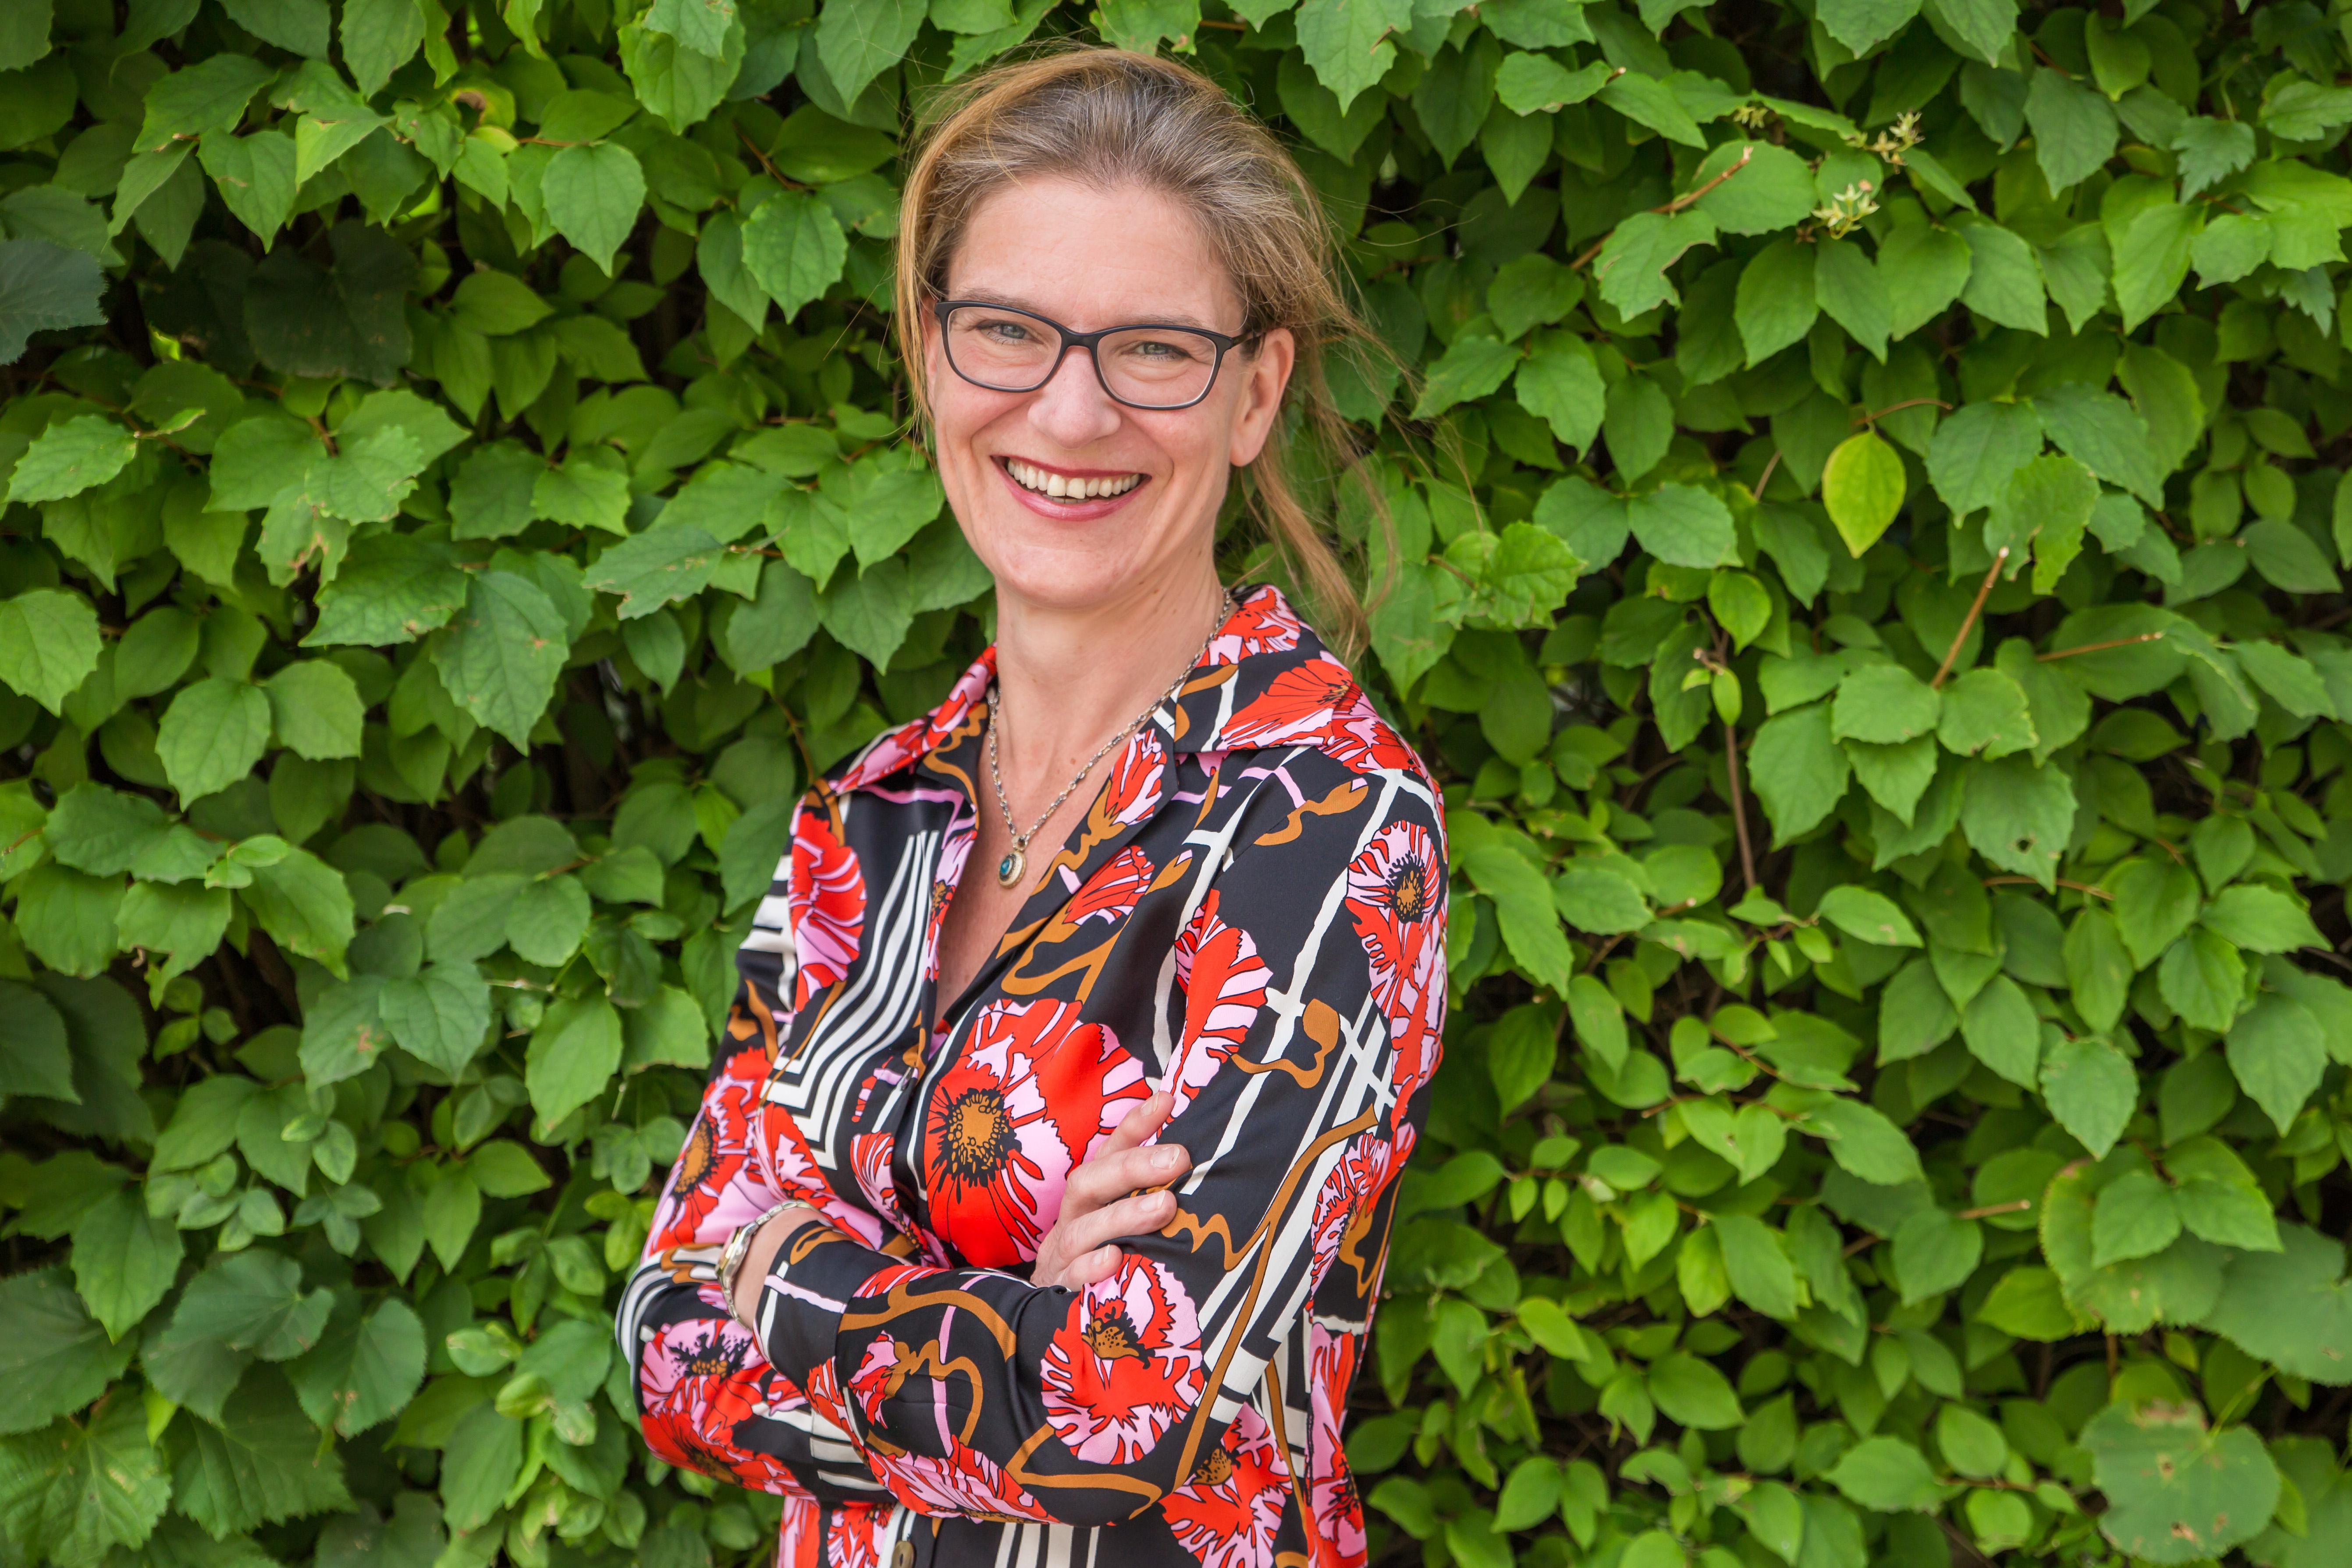 This image shows a photo of Angela Schultz-Zehden